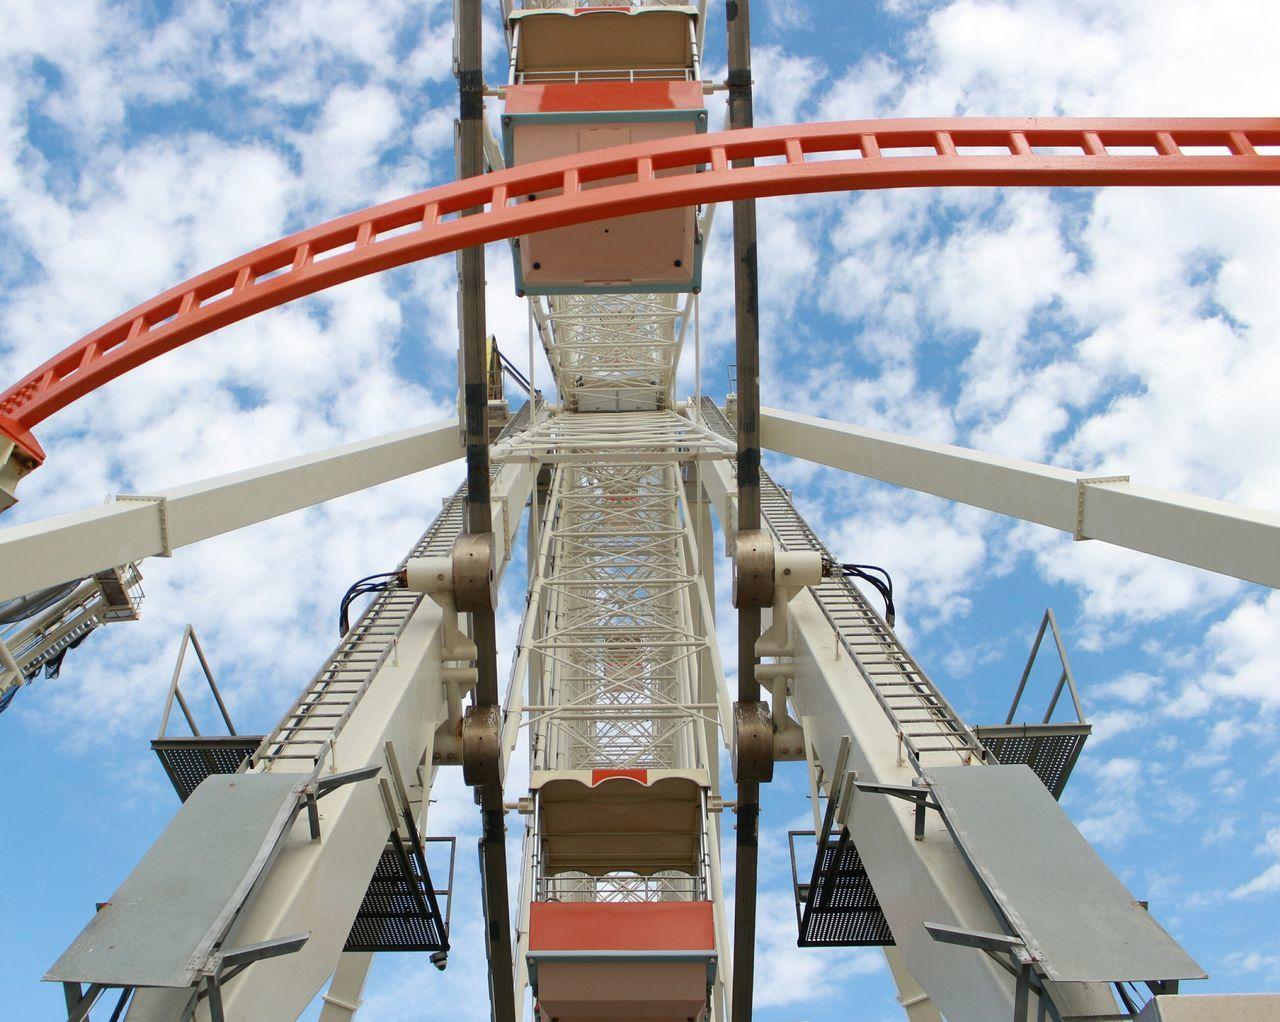 Sky Cloud - Sky Rollercoaster City Outdoors Day No People Ferriswheel Ferris Wheel View Ferris Wheel Mechanical Art Mechanical